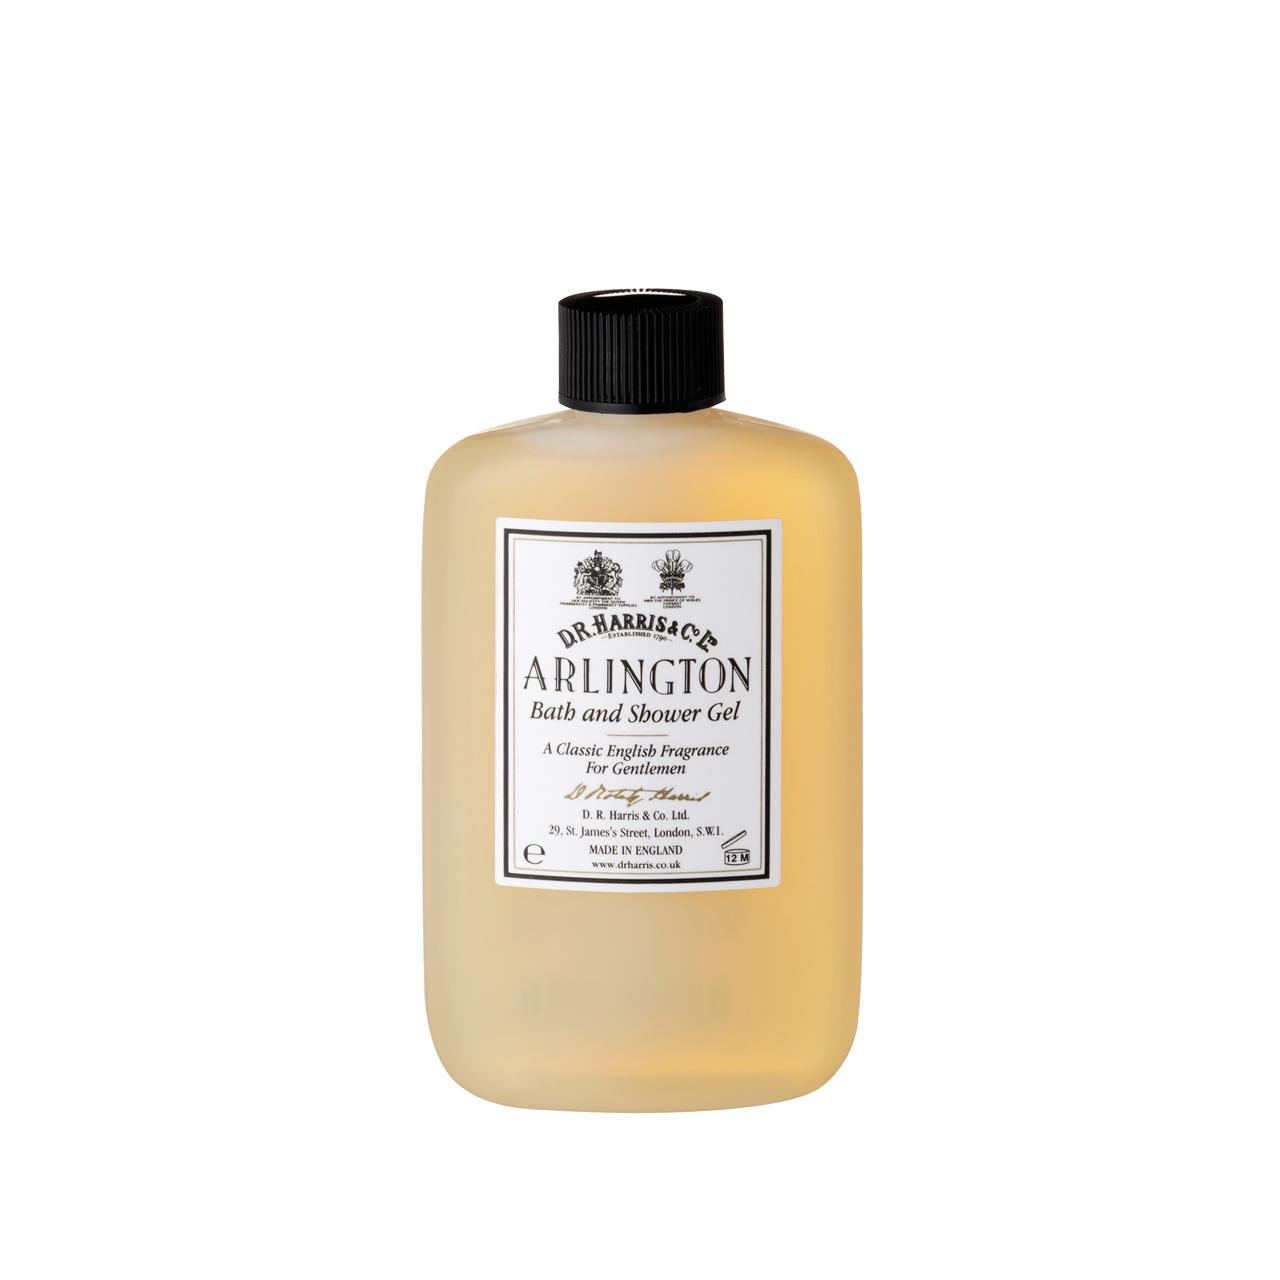 Arlington - Bath Gel